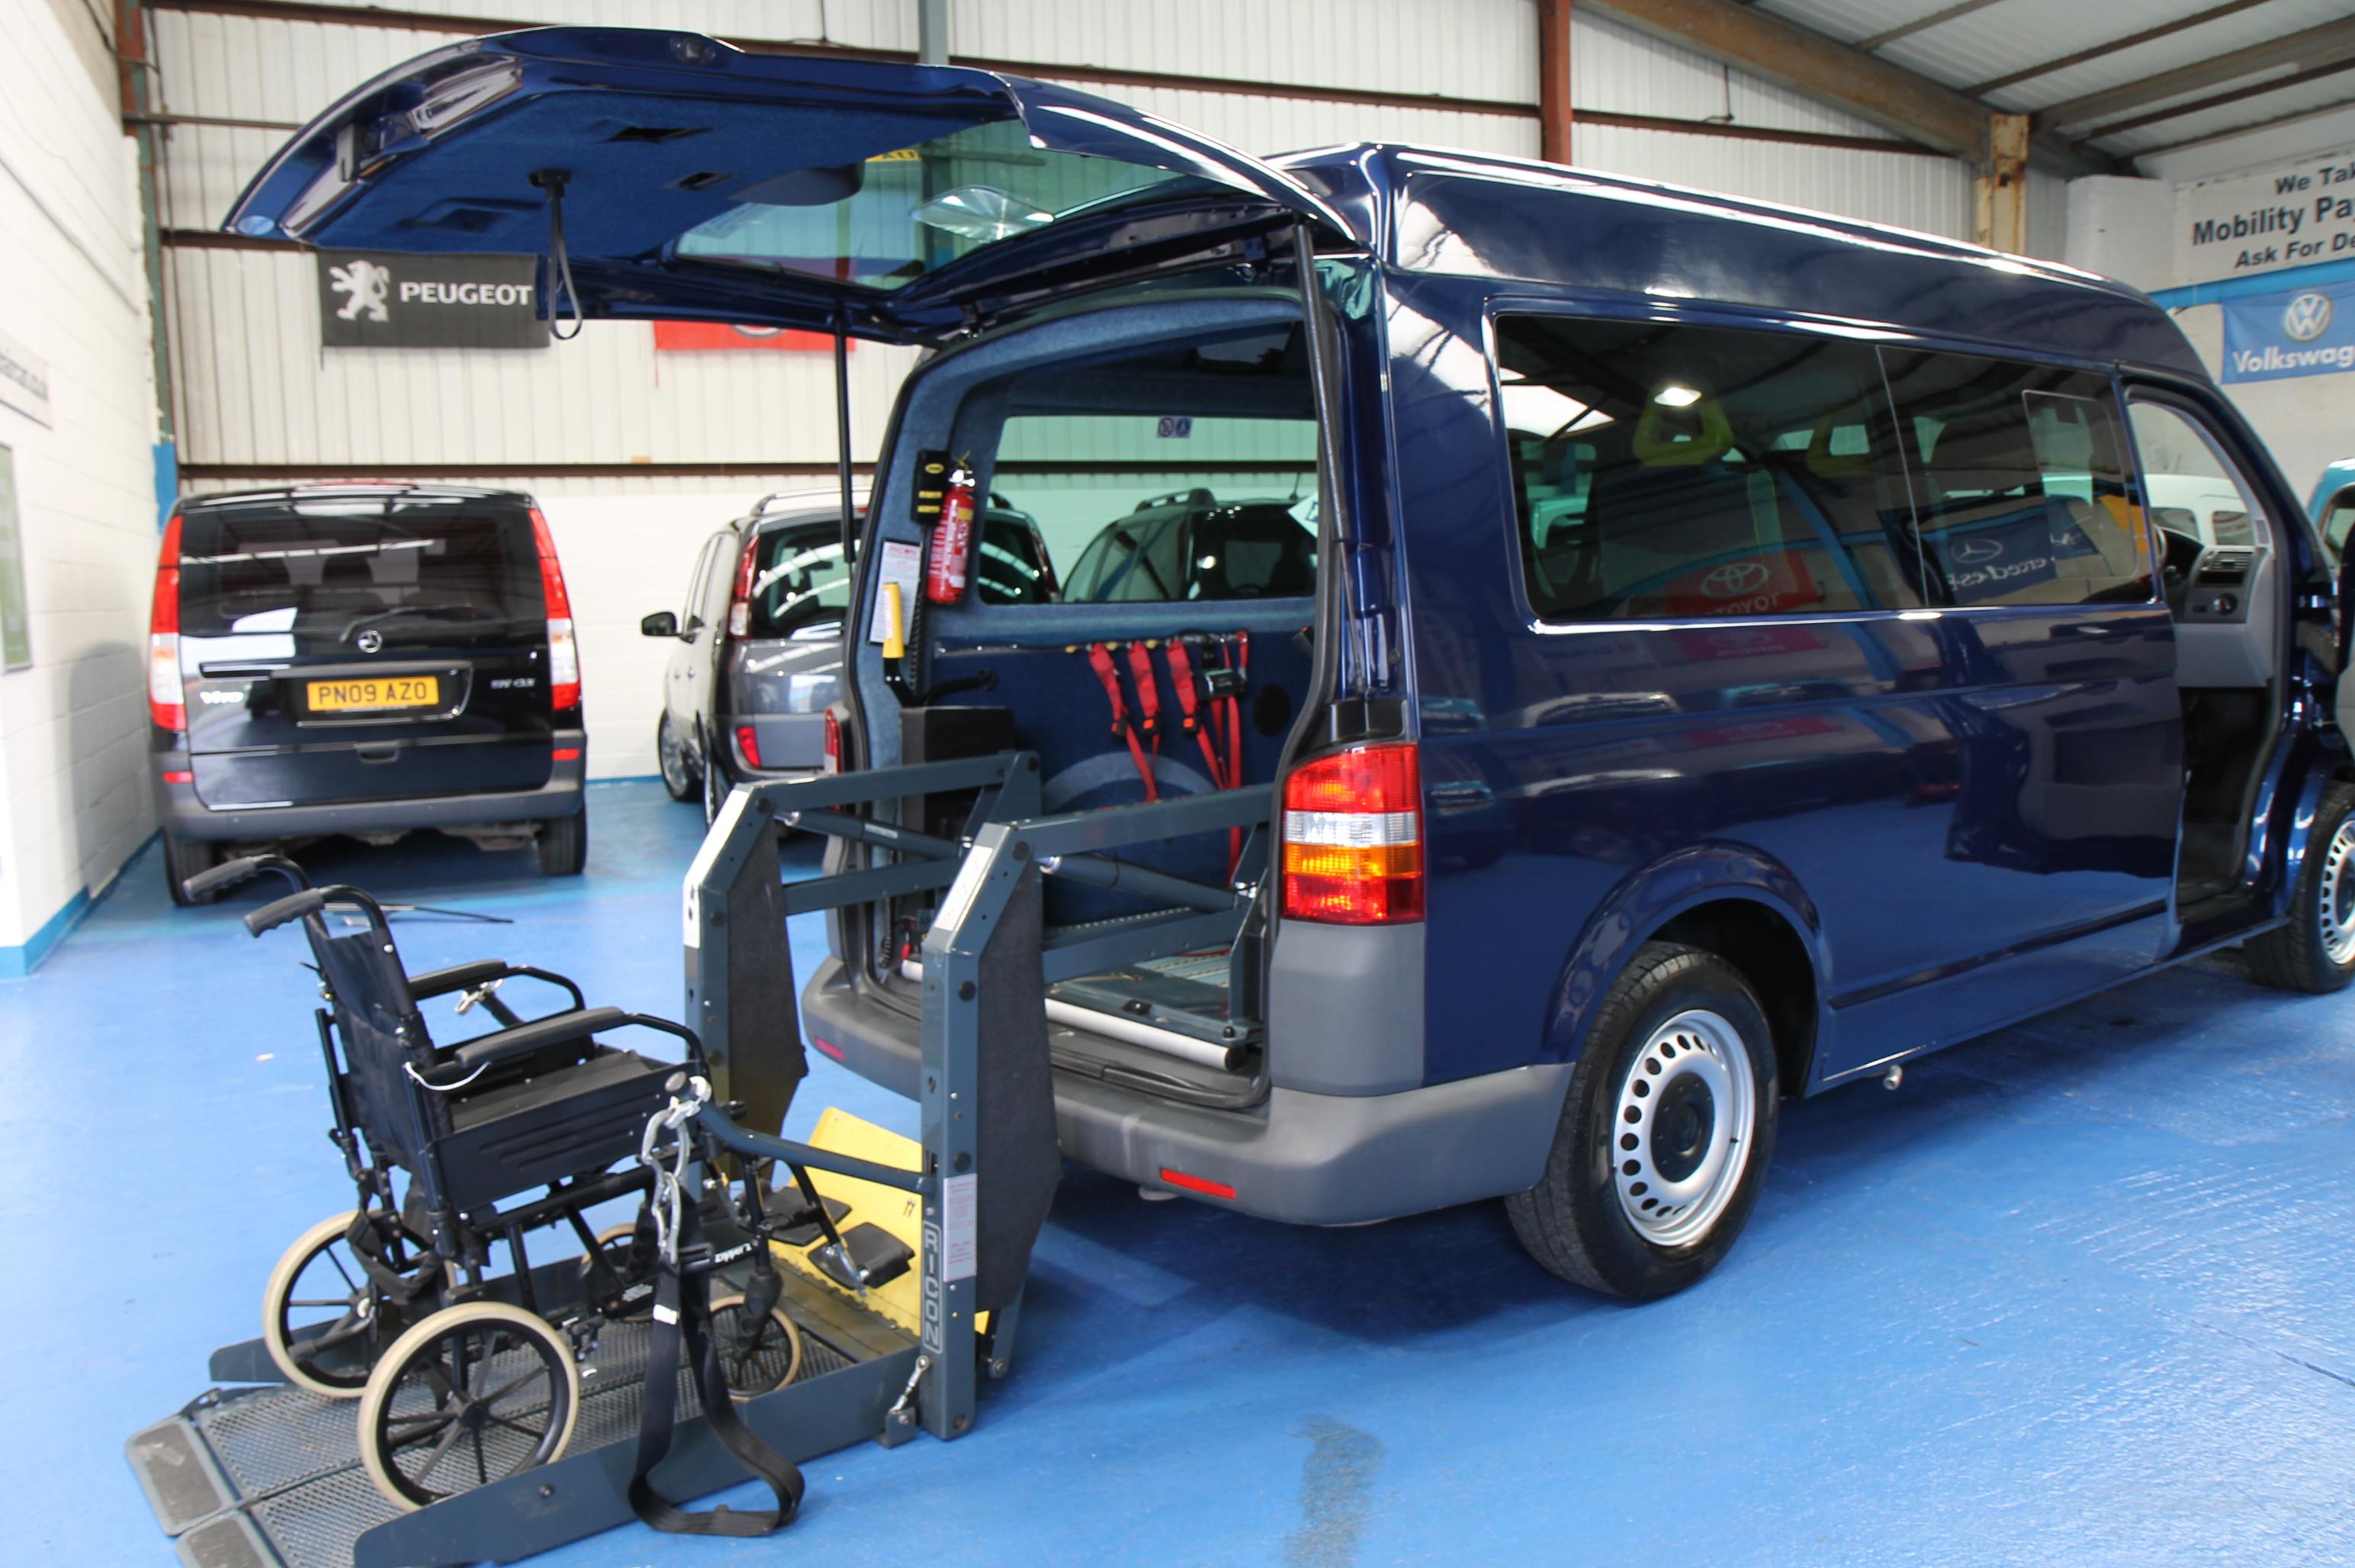 Vw Transporter Wheelchair Vehicle 3 Jpg